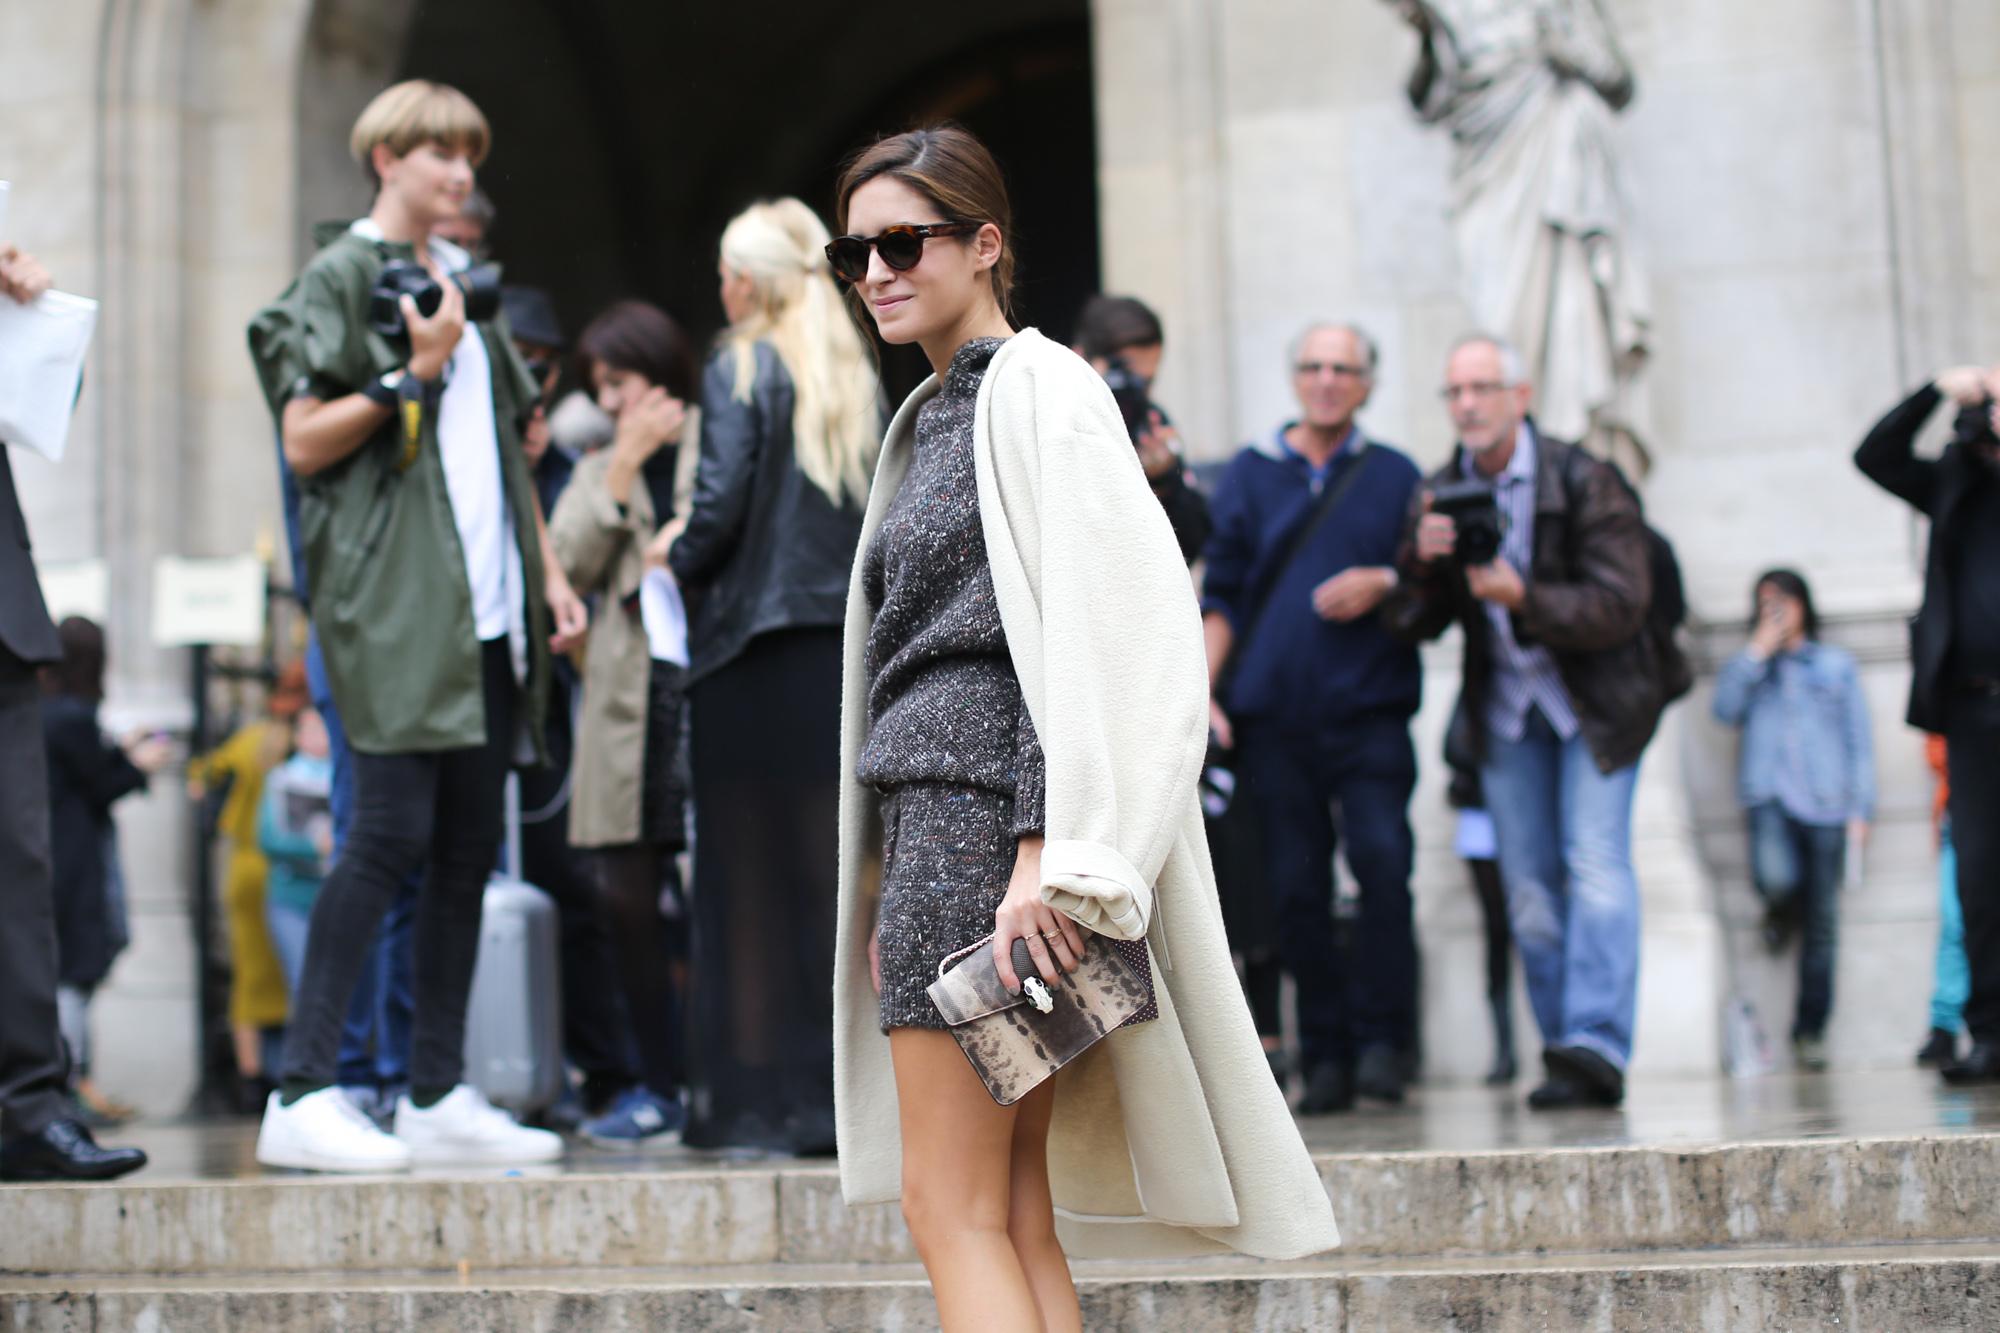 Clochet-streetstyle-paris-fashion-week-gala-gonzalez-stella-mccartney